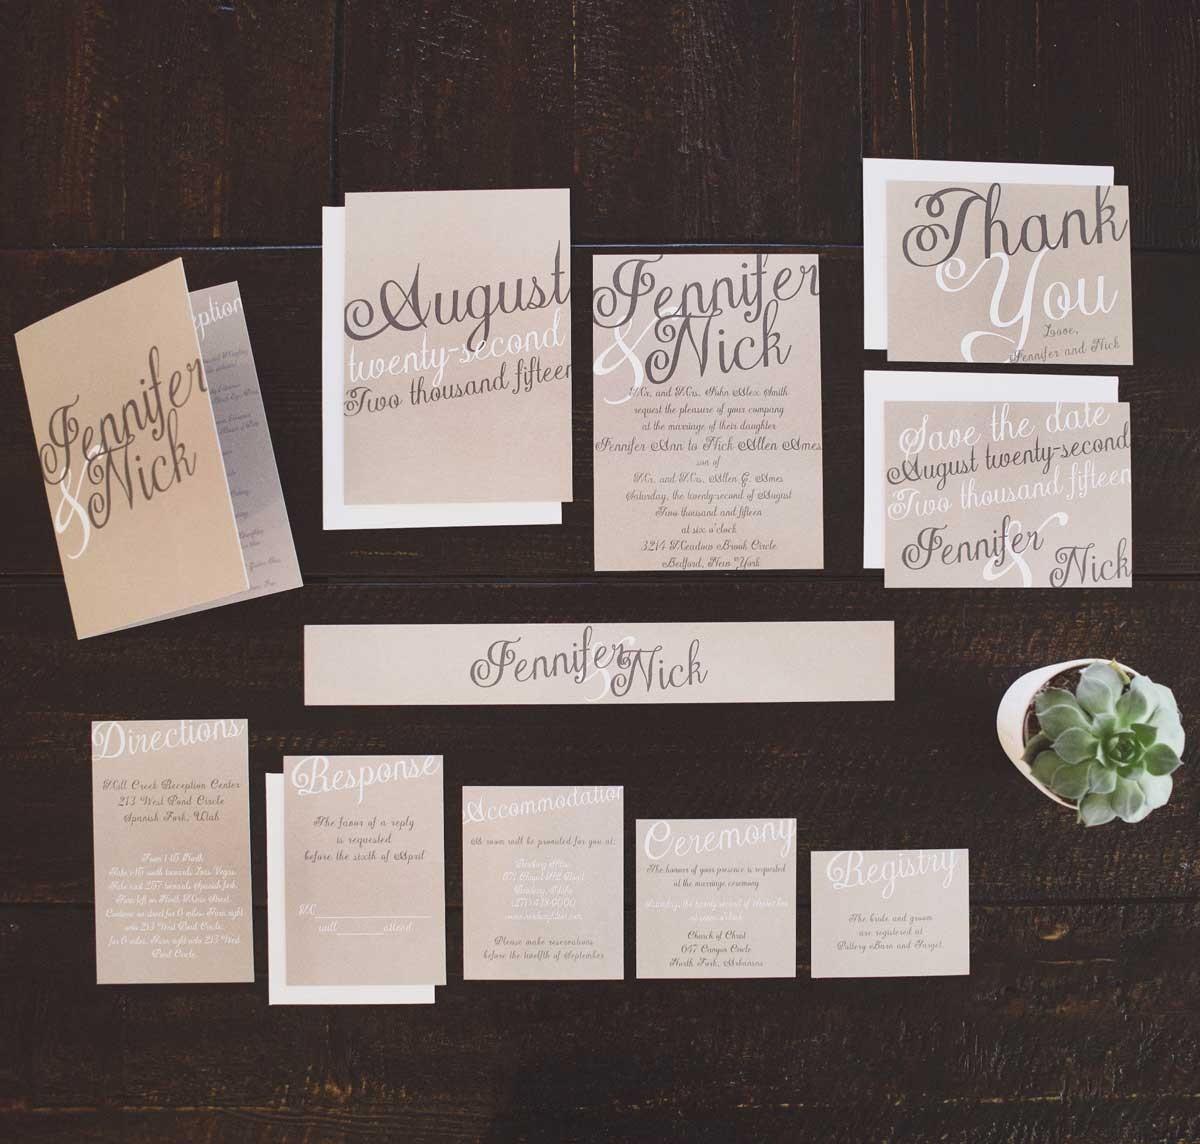 Wedding Invitations On Kraft Paper Brown Paper Wedding Invitations The Elegant Kraft Wedding Invitation